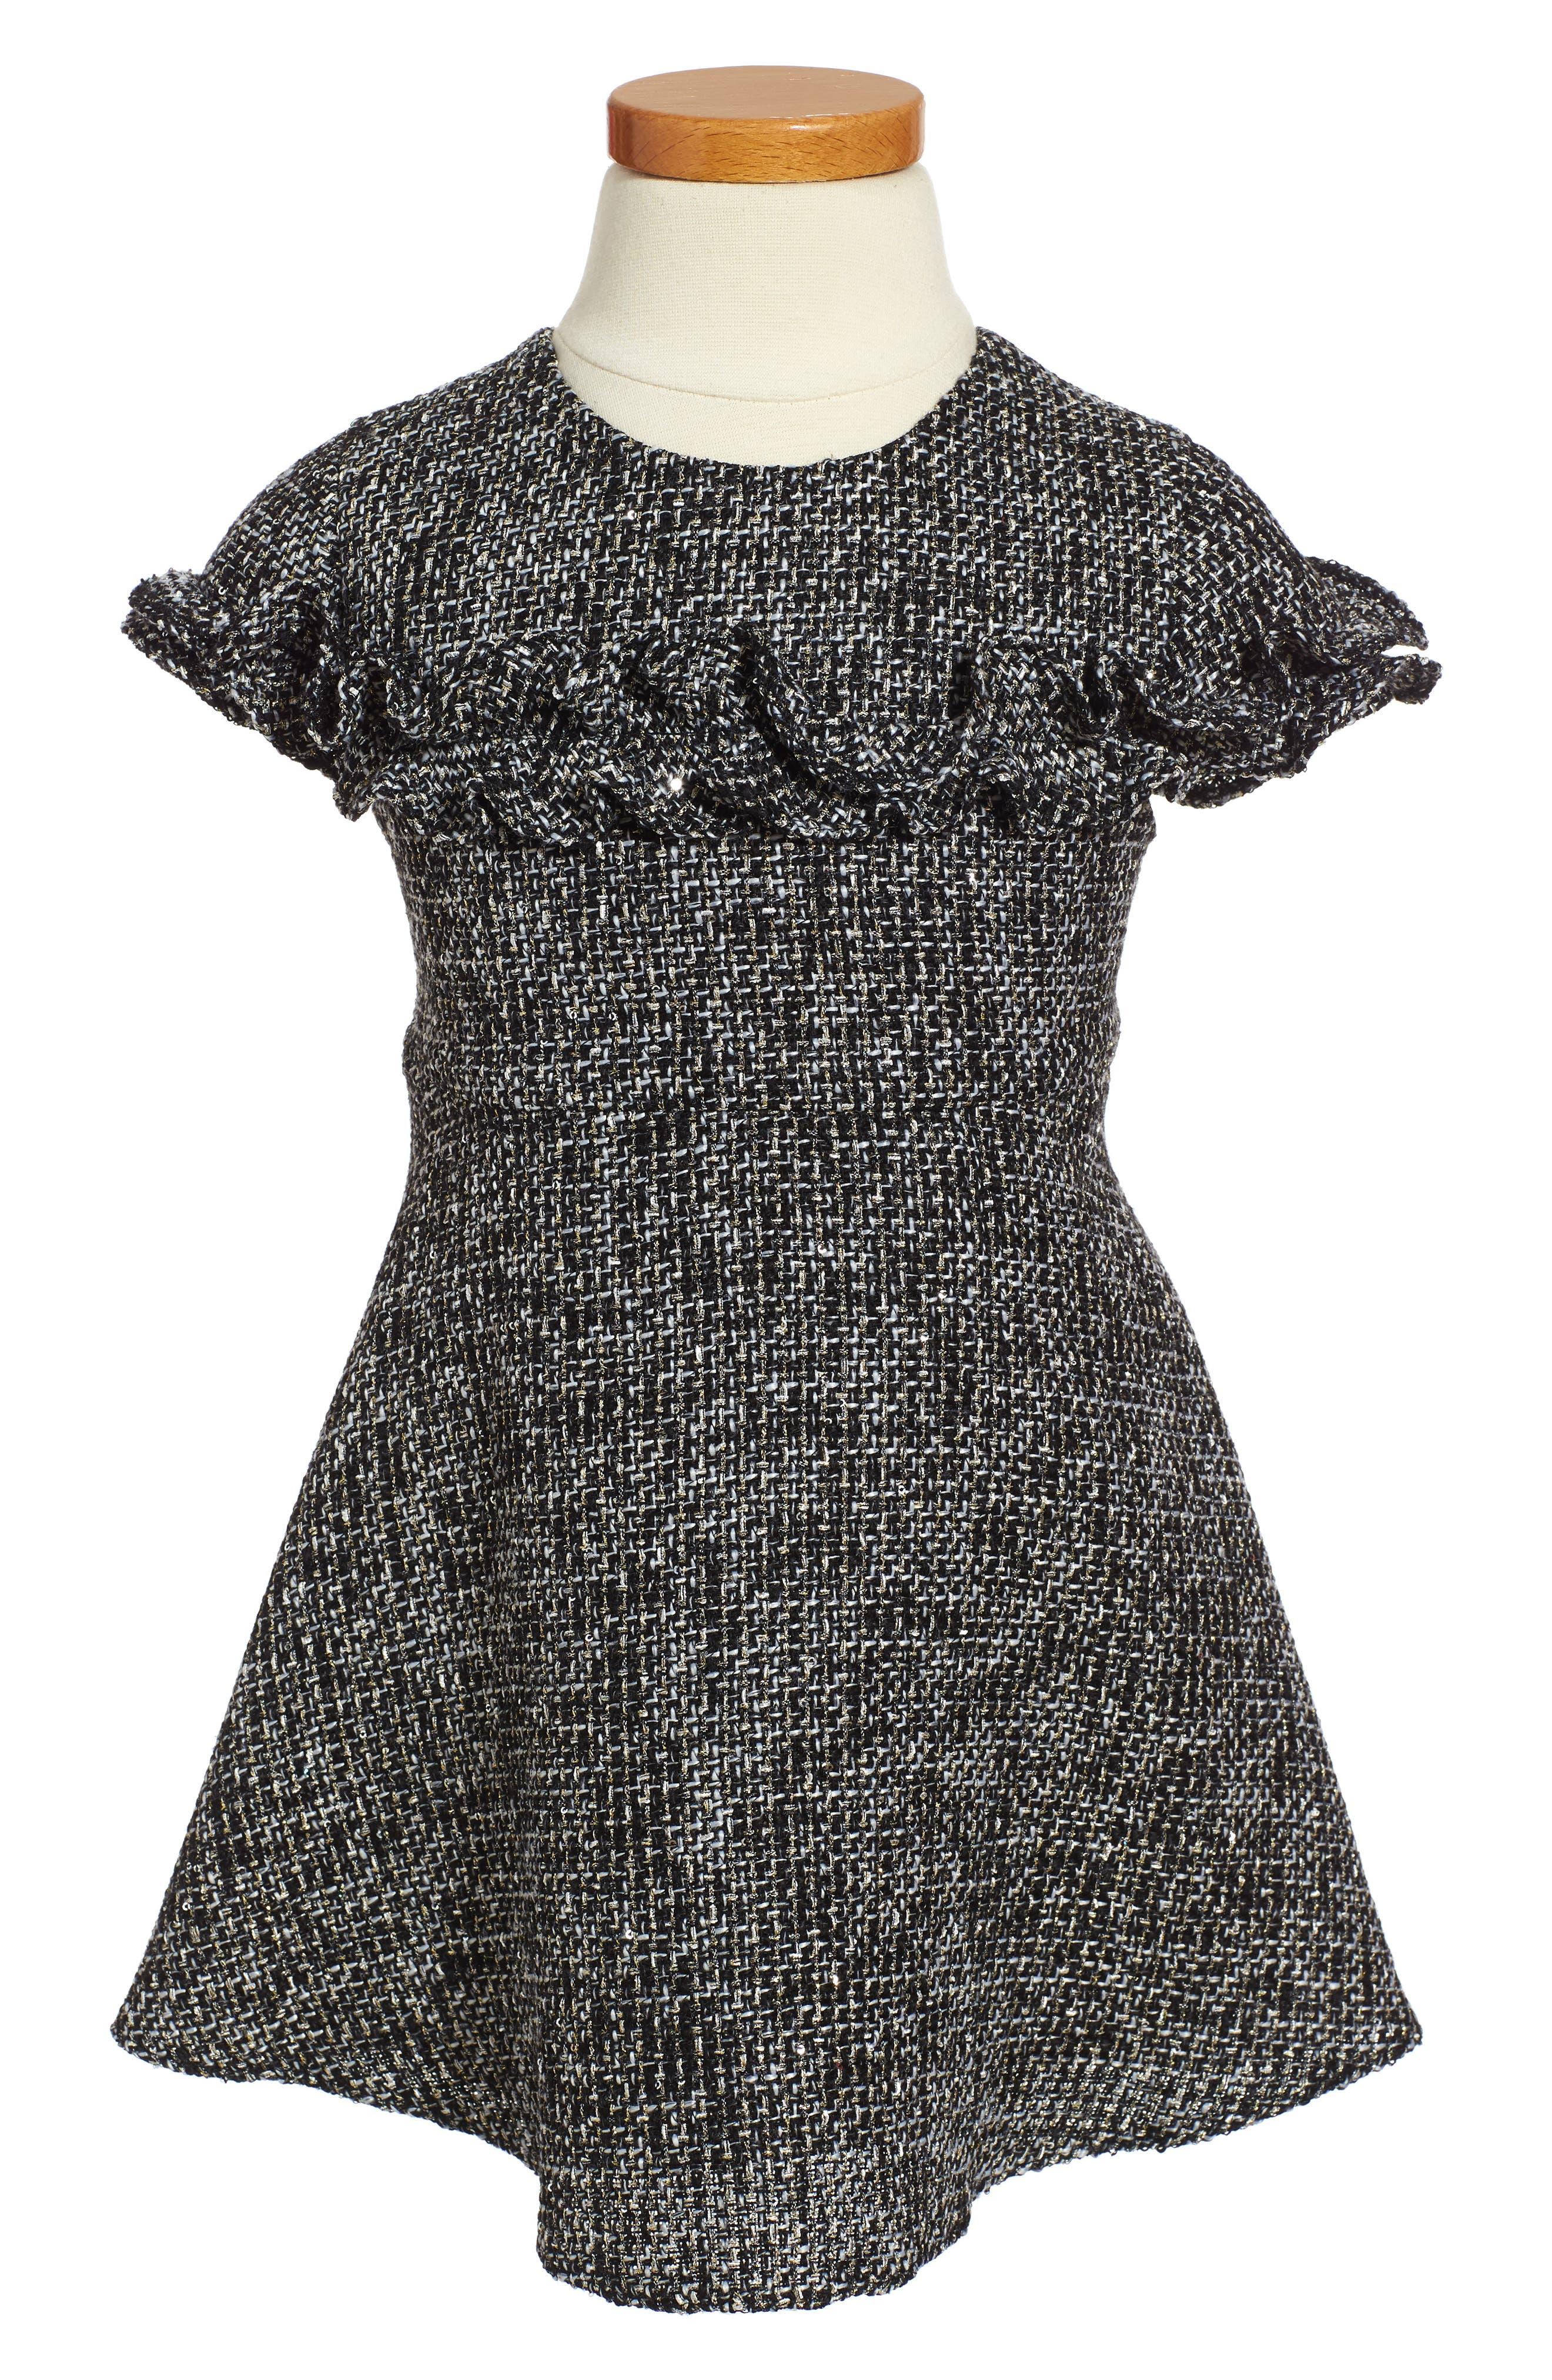 Alternate Image 1 Selected - David Charles Sequin Tweed Dress (Toddler Girls & Little Girls)